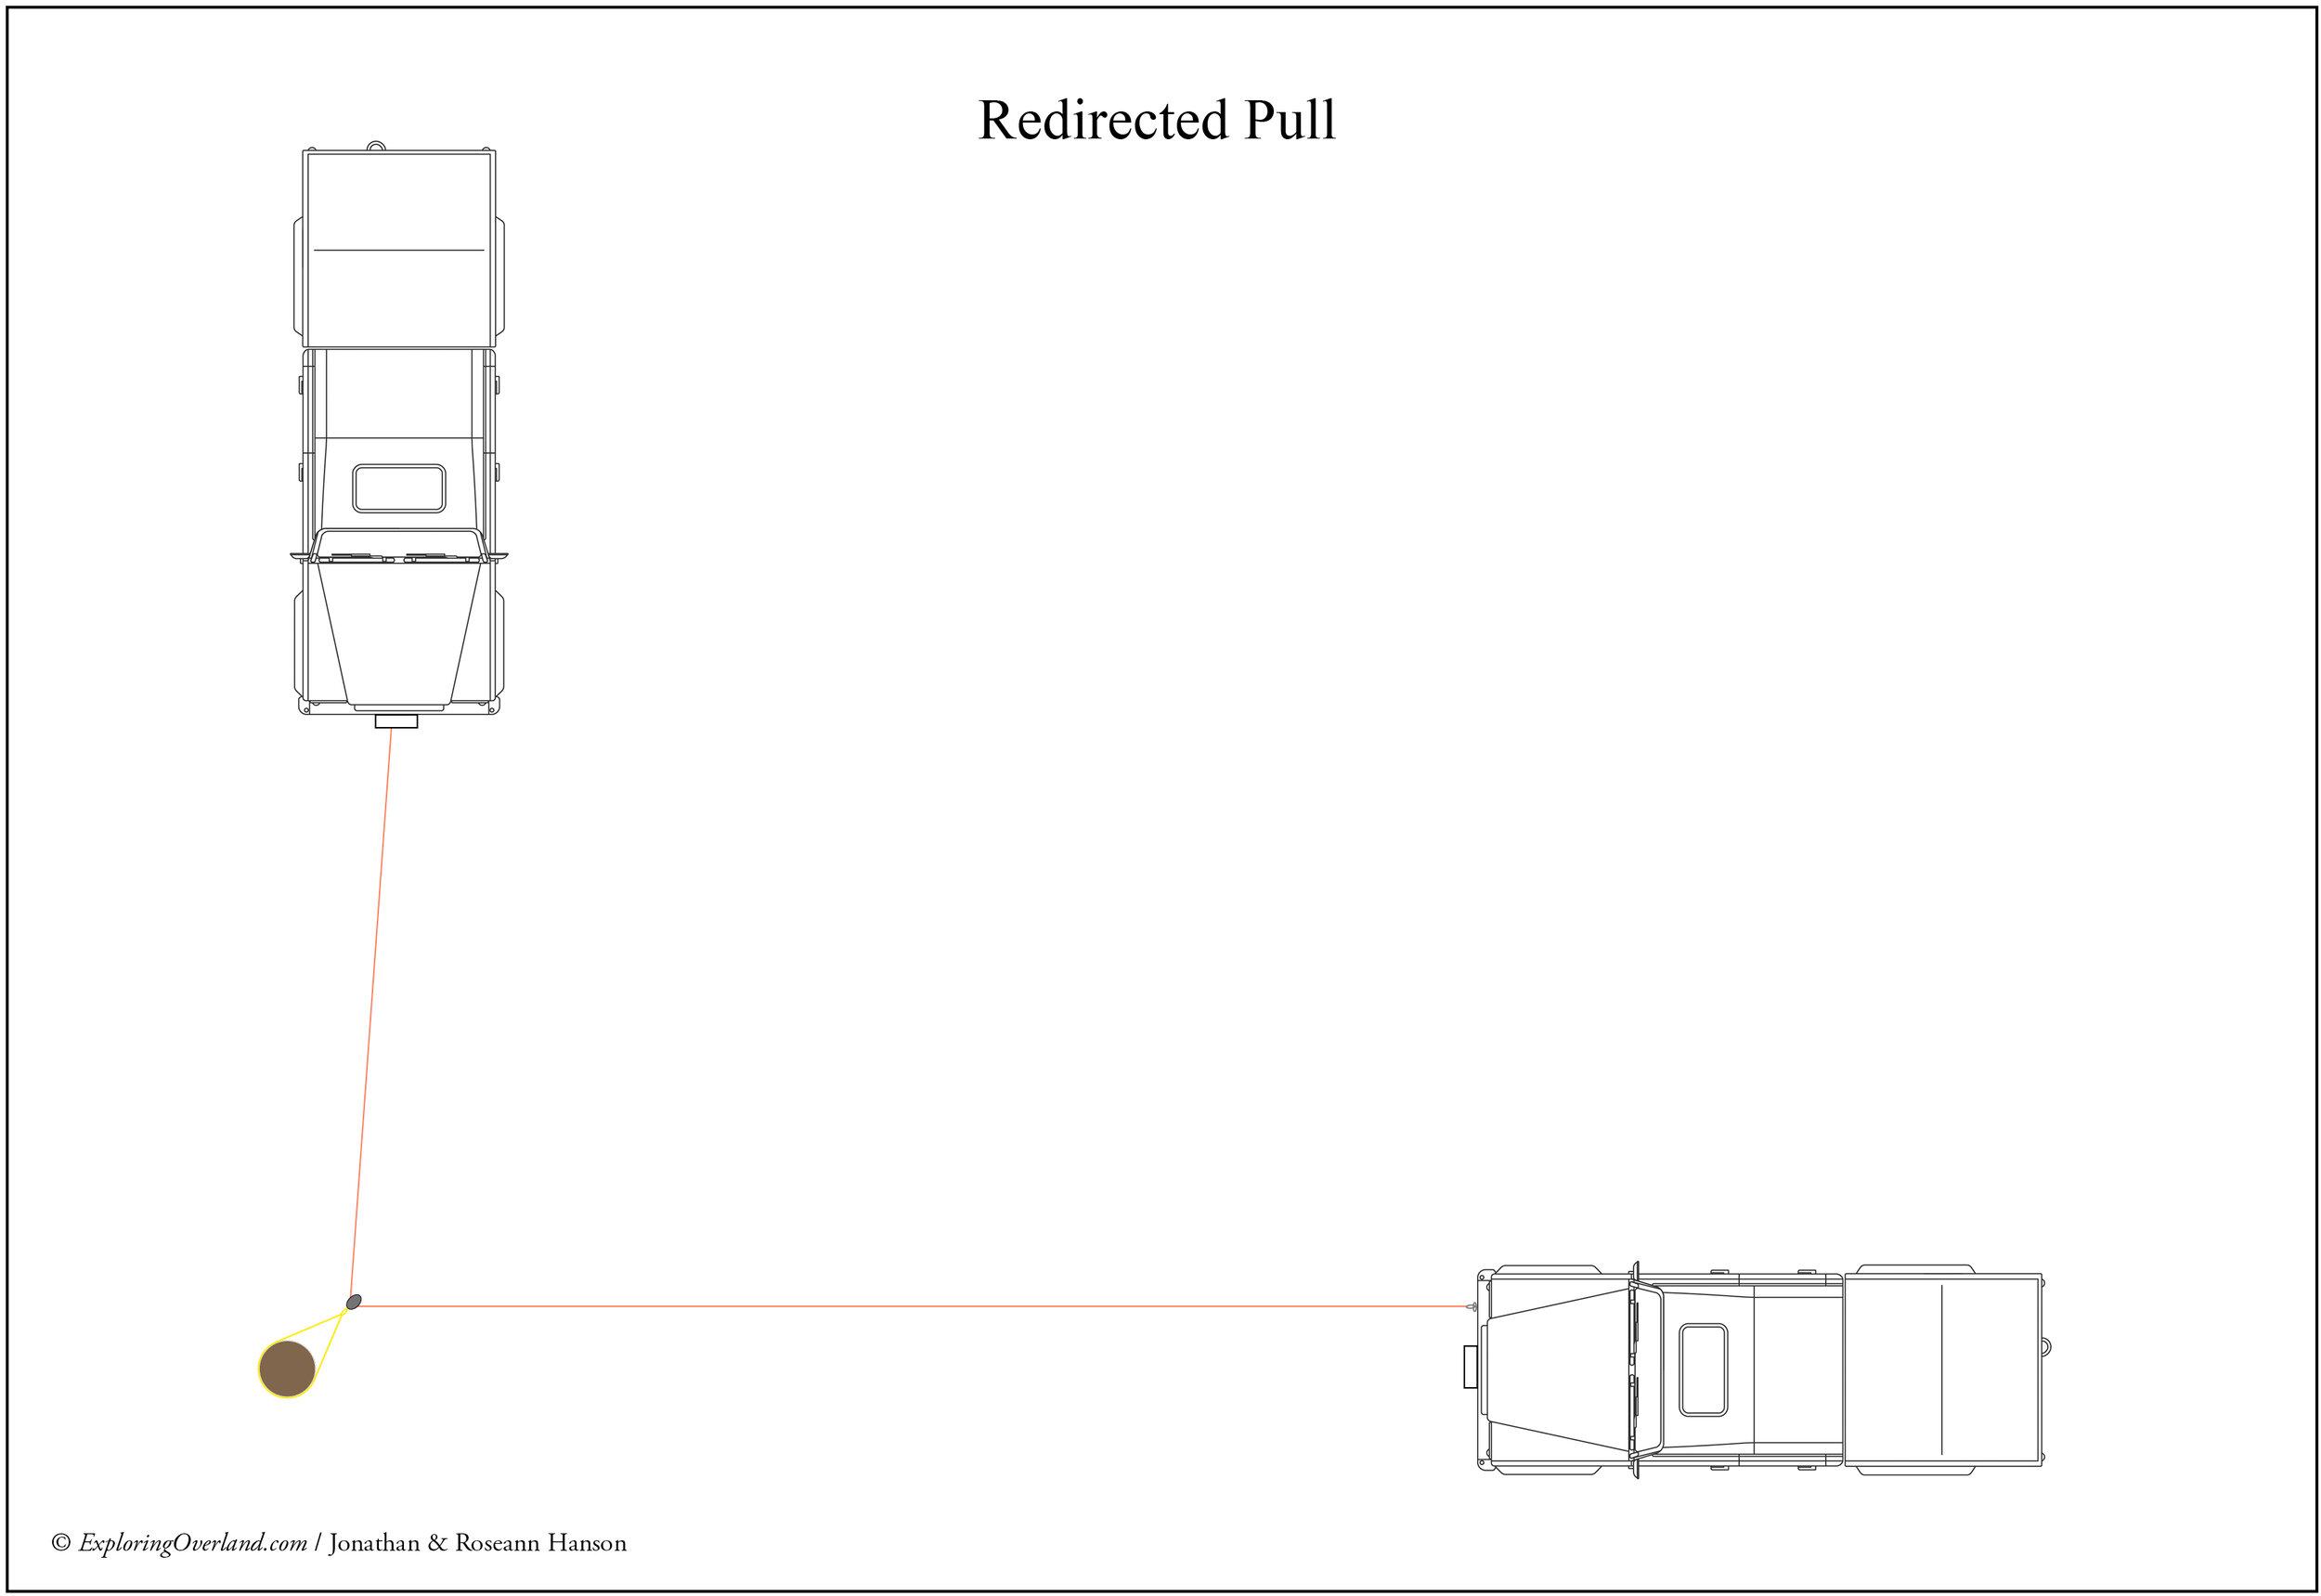 quadboss winch wiring diagram simple winch diagram lair faint vdstappen loonen nl  simple winch diagram lair faint